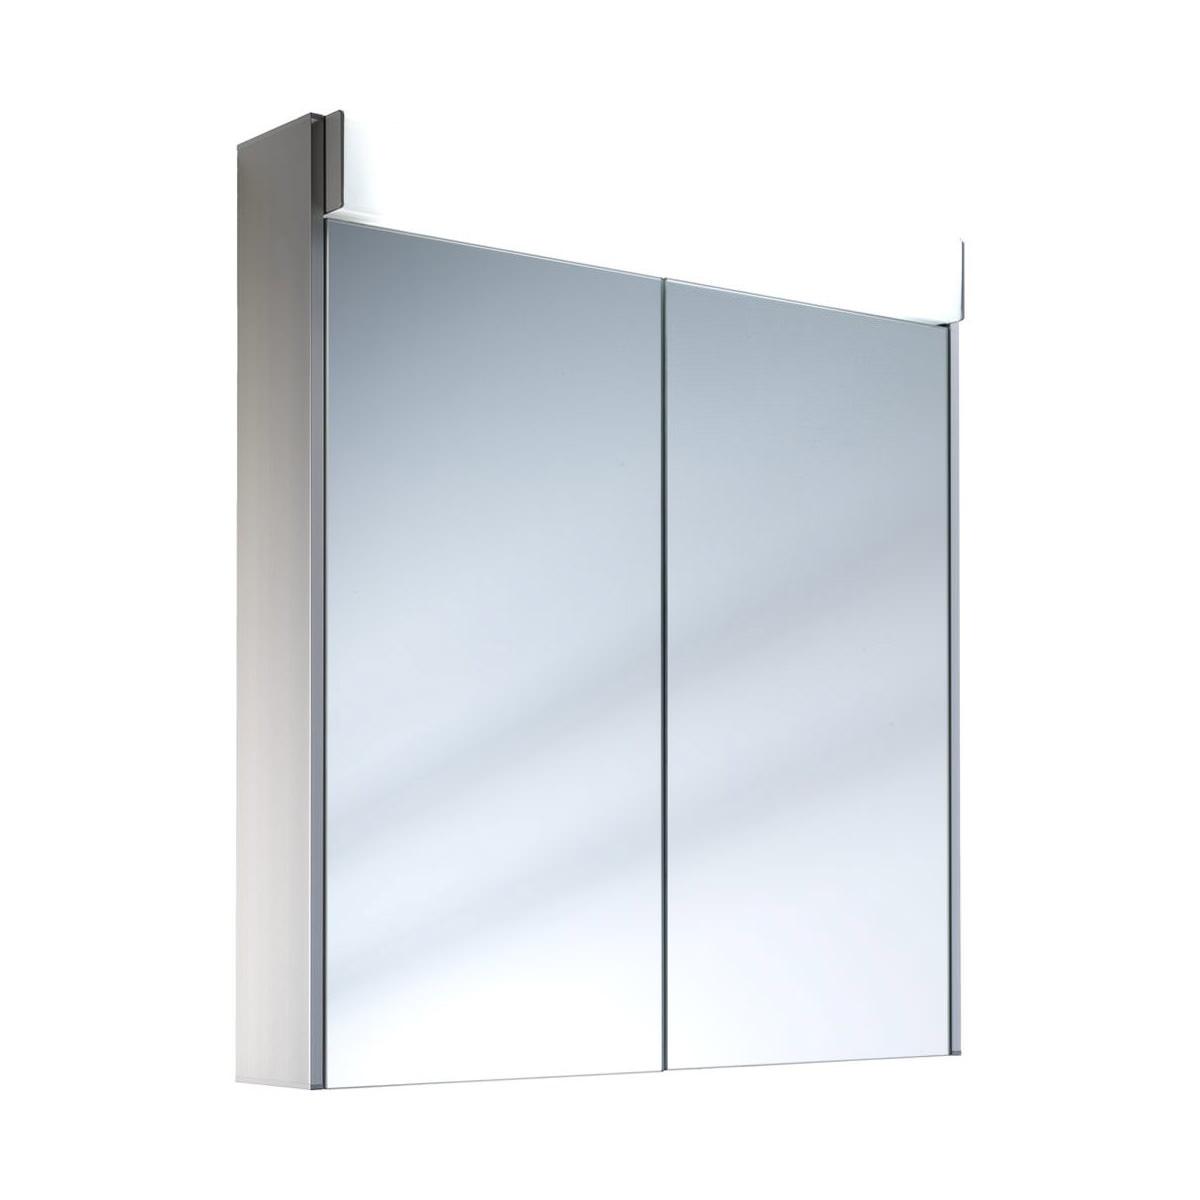 Schneider moanaline 2 door 700mm mirror cabinet with for Bathroom cabinets 700mm